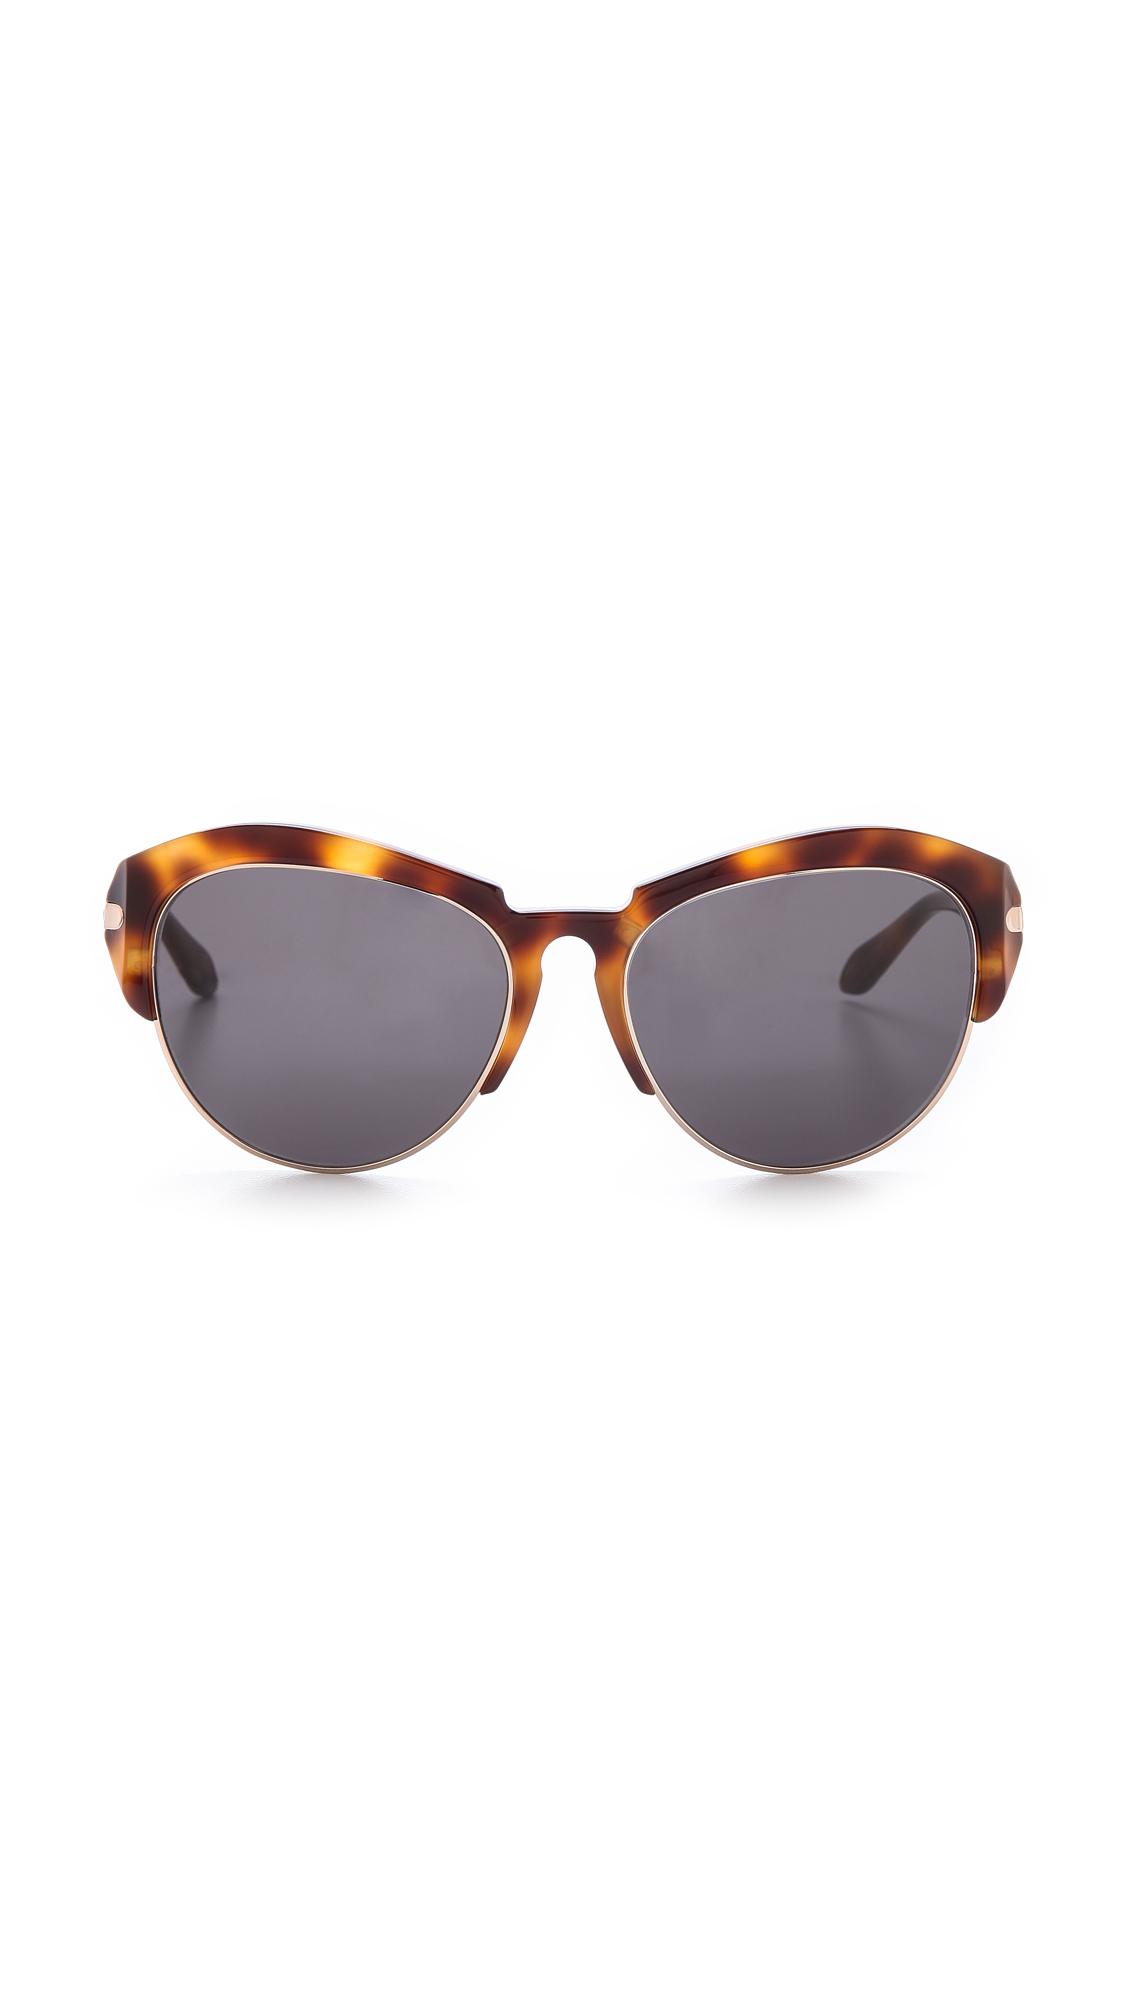 Givenchy Rimless Bottom Sunglasses Dark Havanasmoke in ...